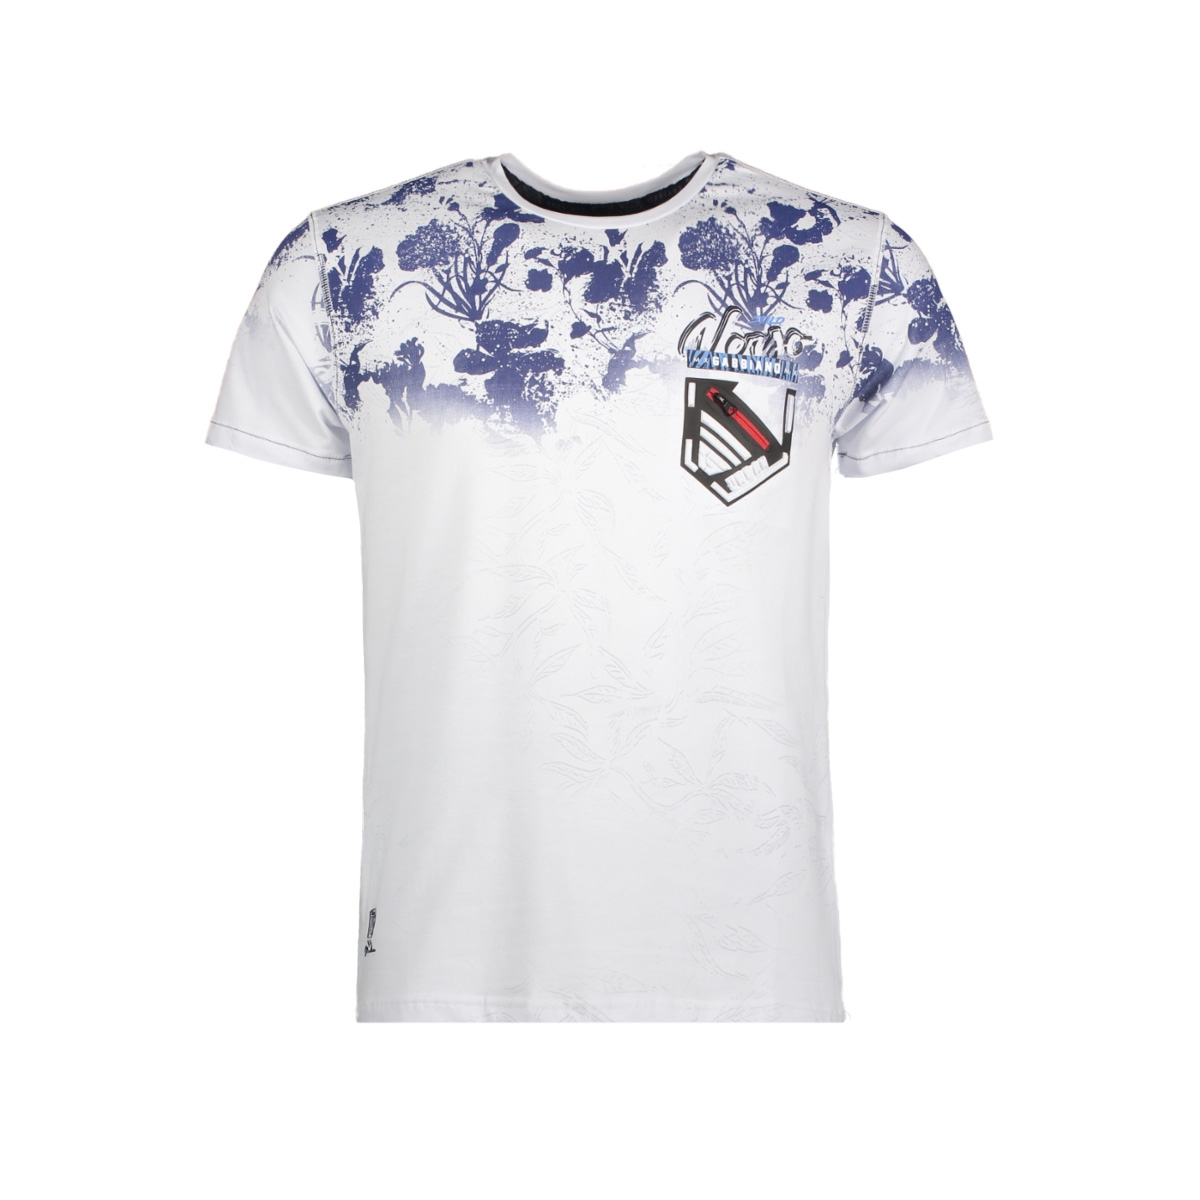 13895 gabbiano t-shirt white